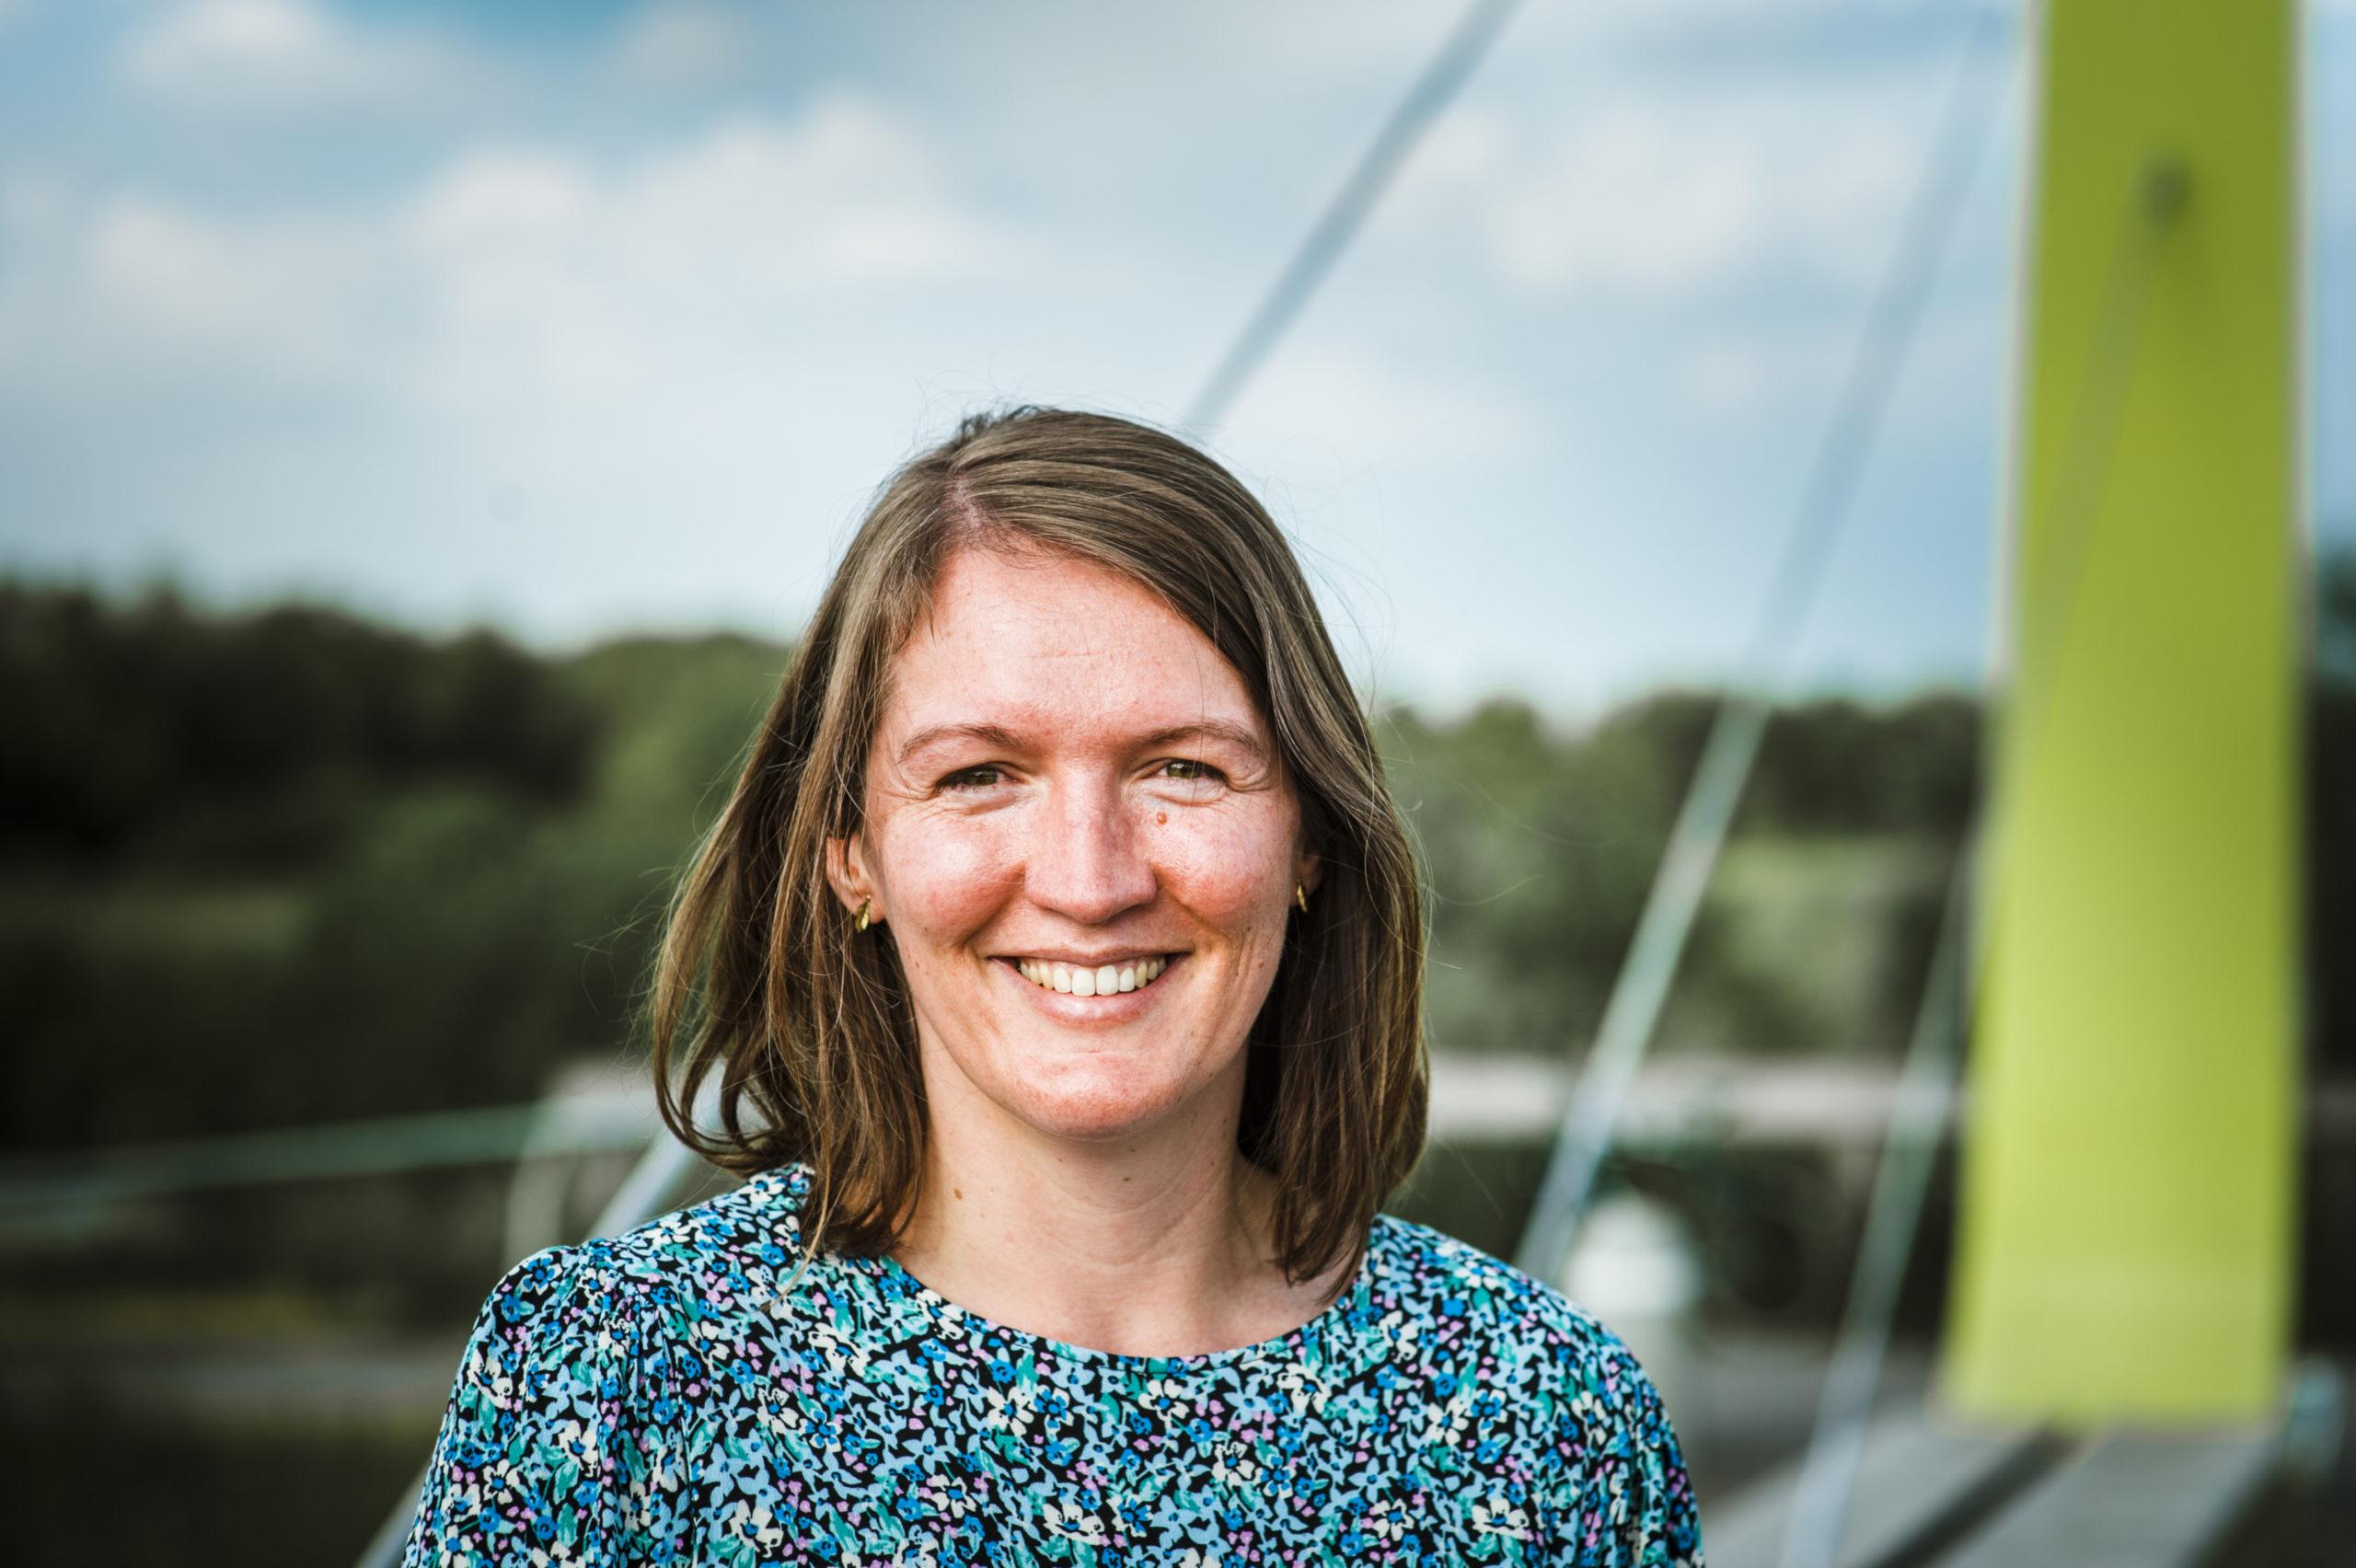 Dr. Sofie Peeters